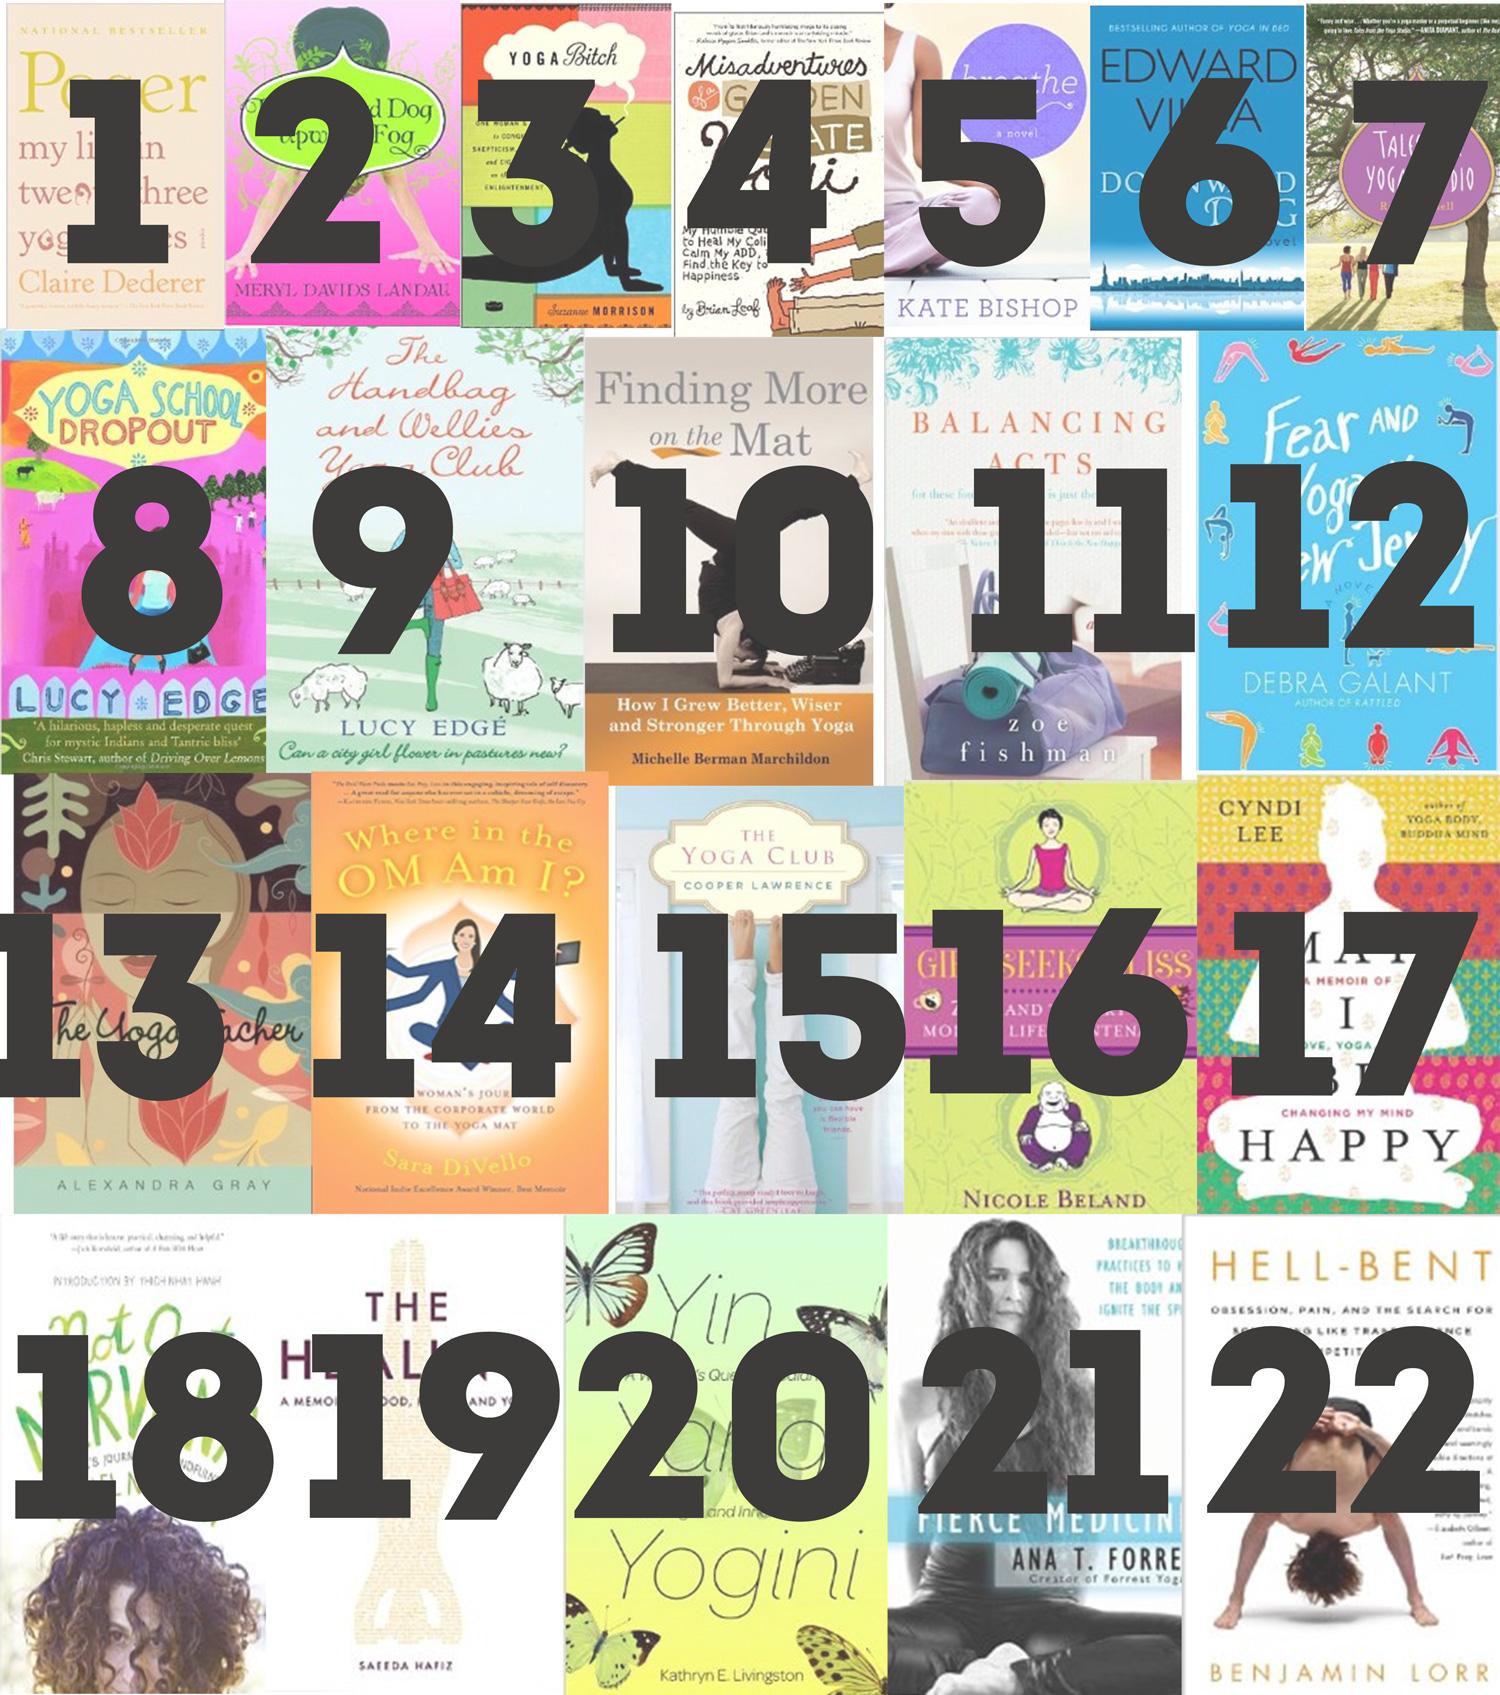 Pin it! 22 Yoga-based novels & memoirs